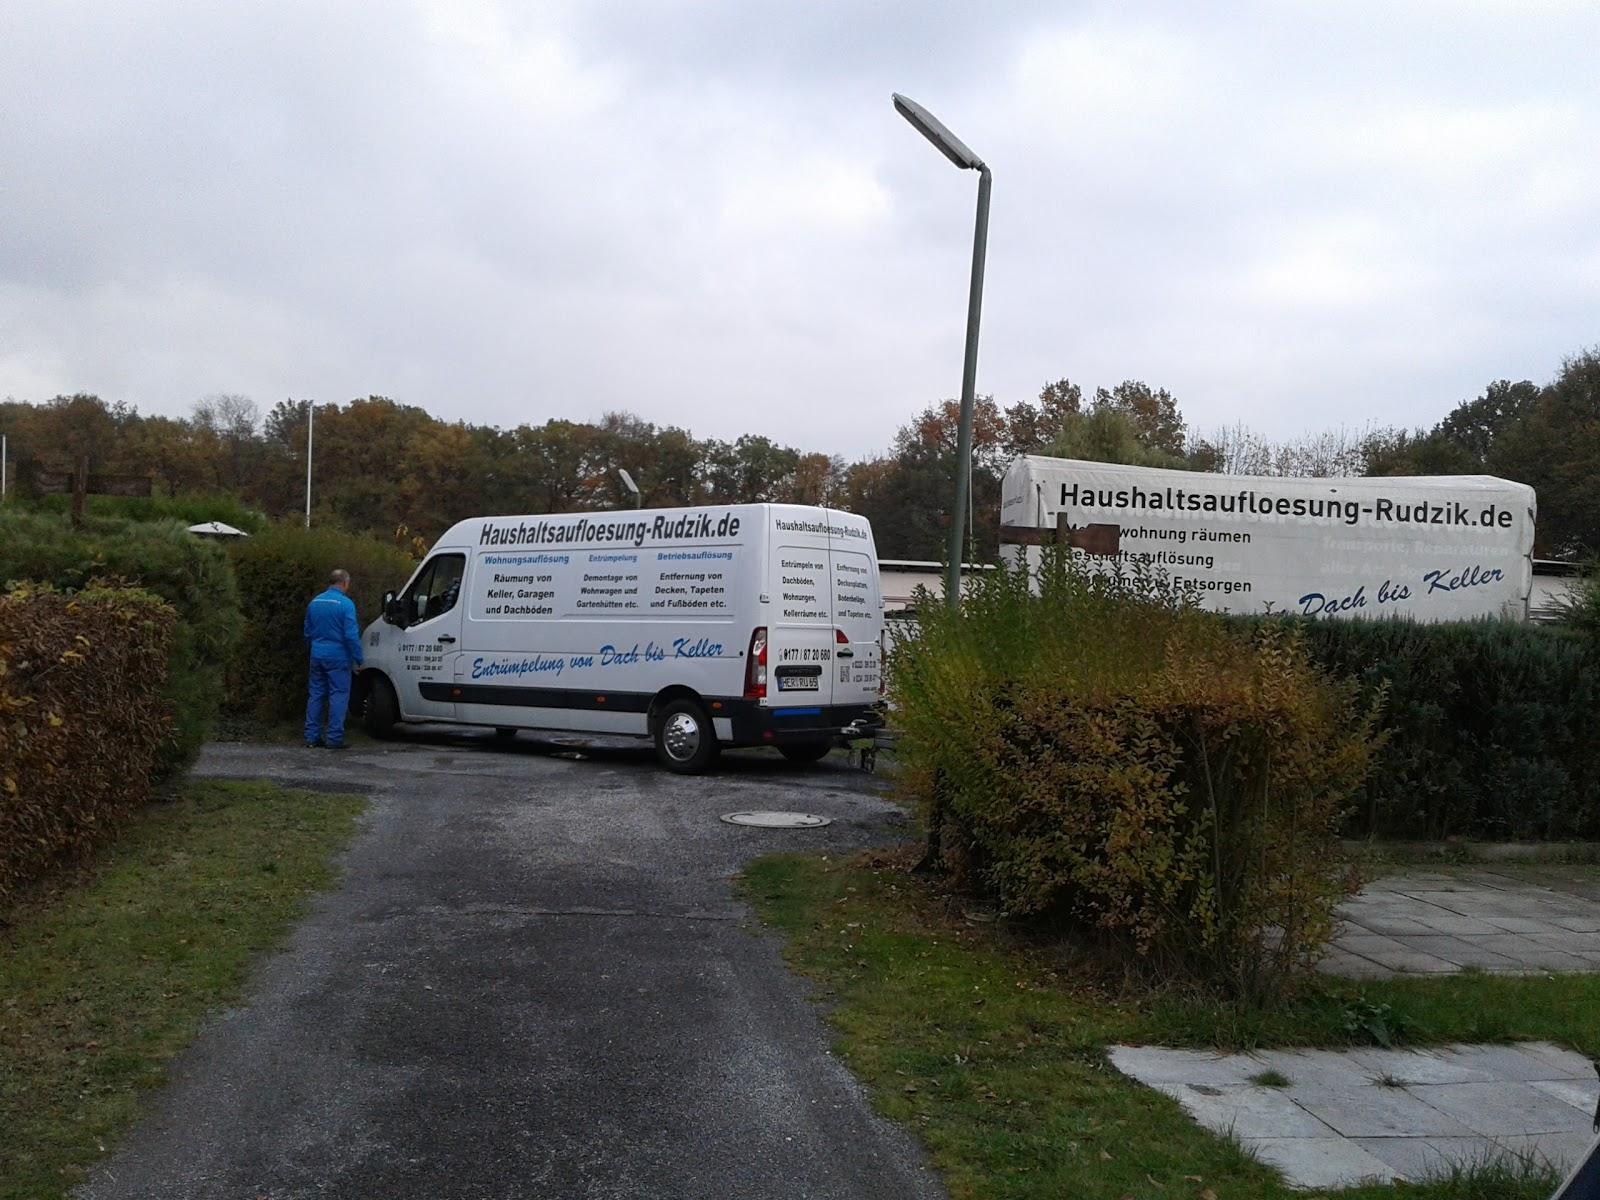 campingplatz budde-rosanowski map - dortmund, germany - mapcarta